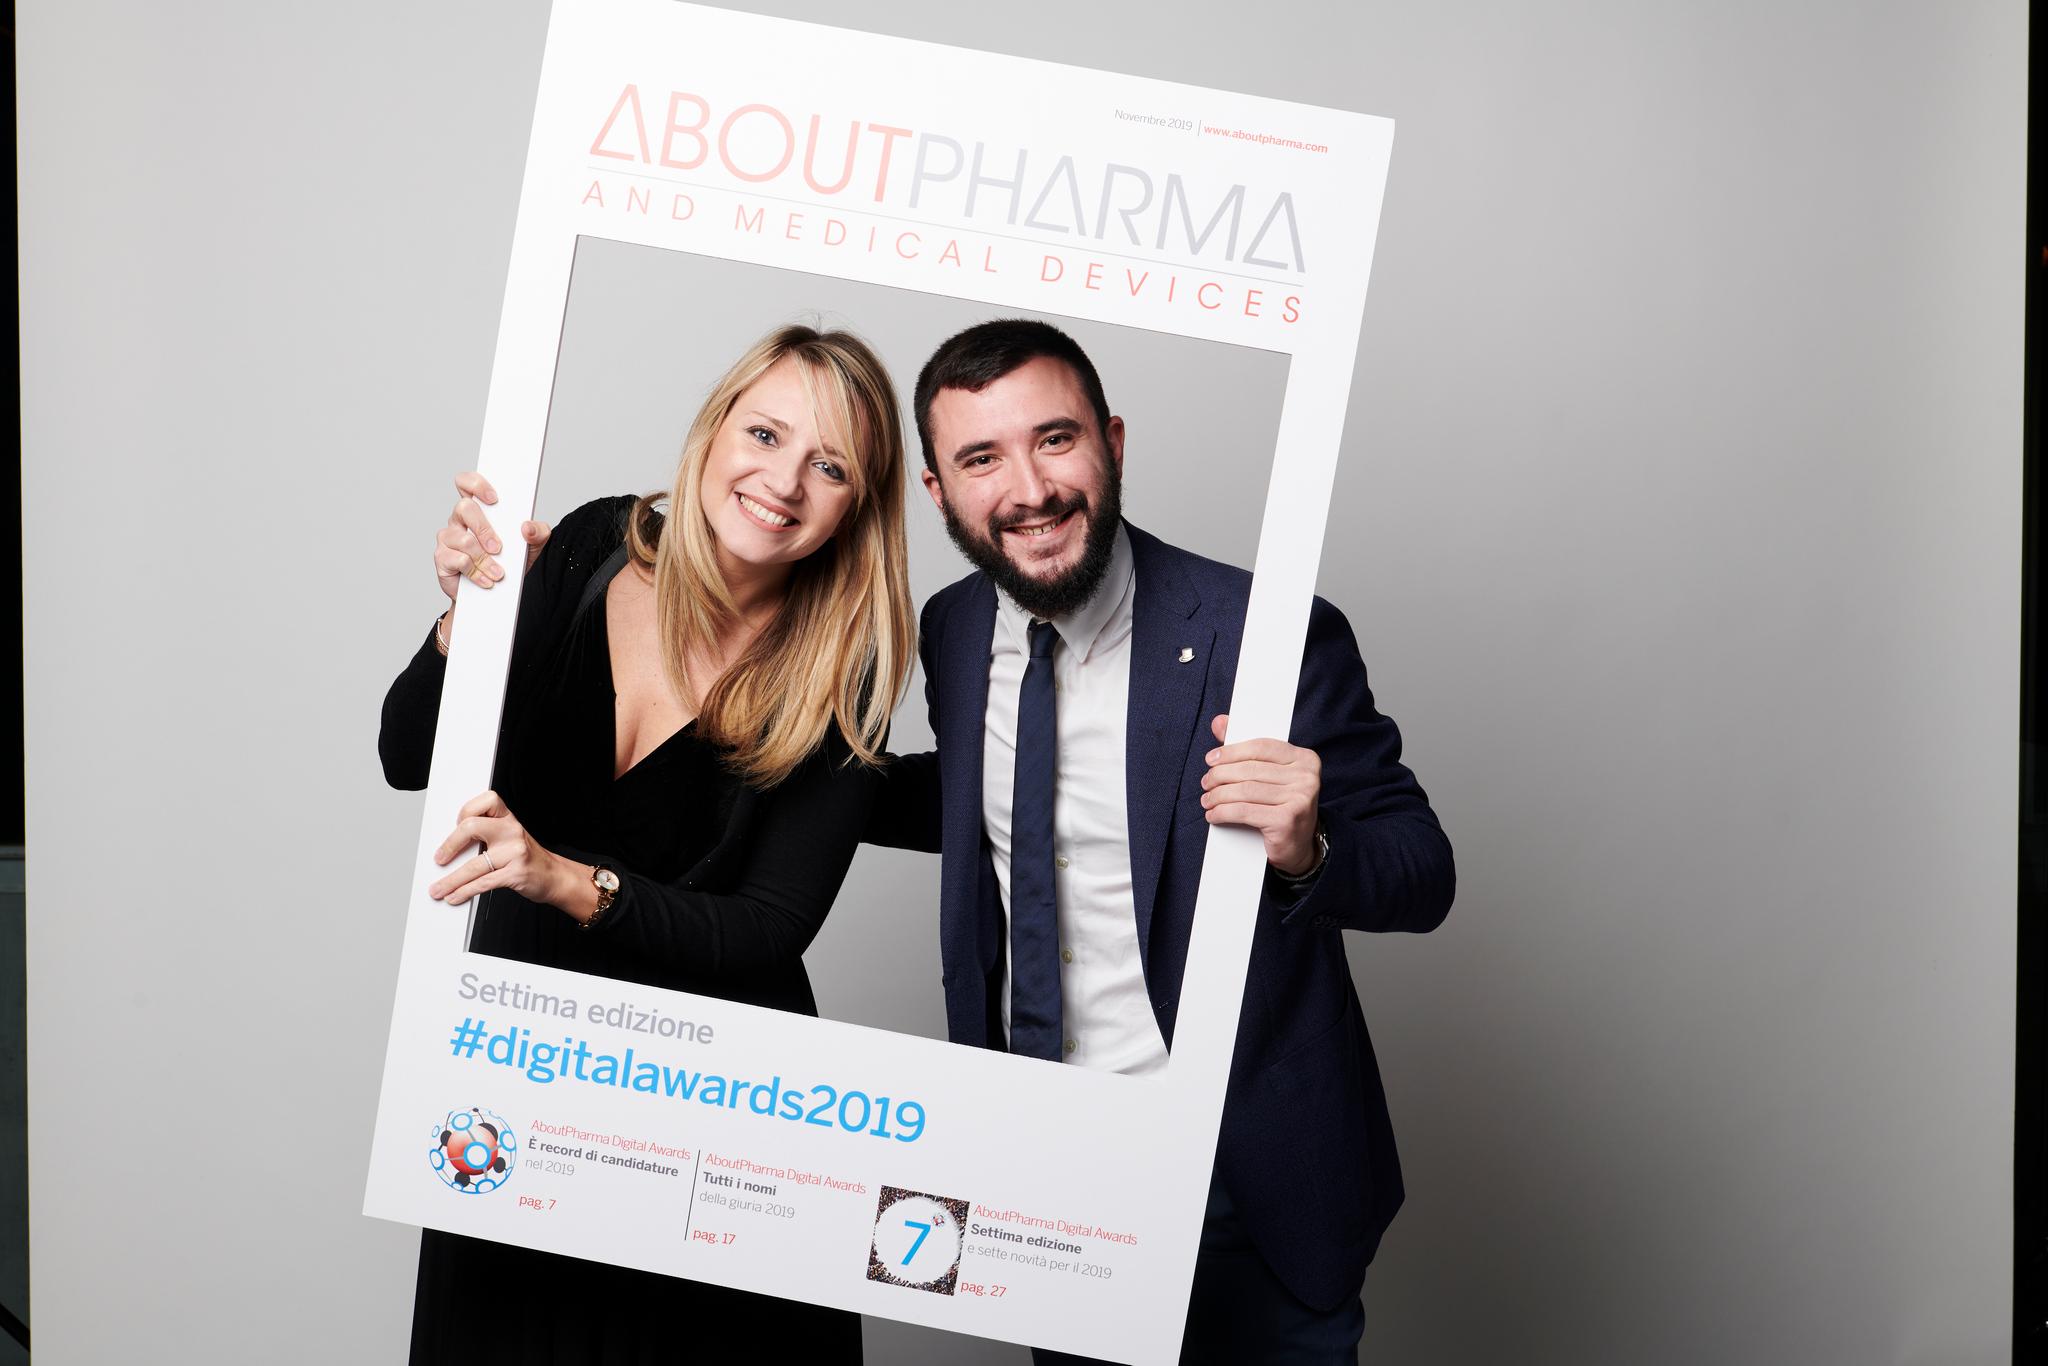 Photobooth AboutPharma Digital Awards 2019_19